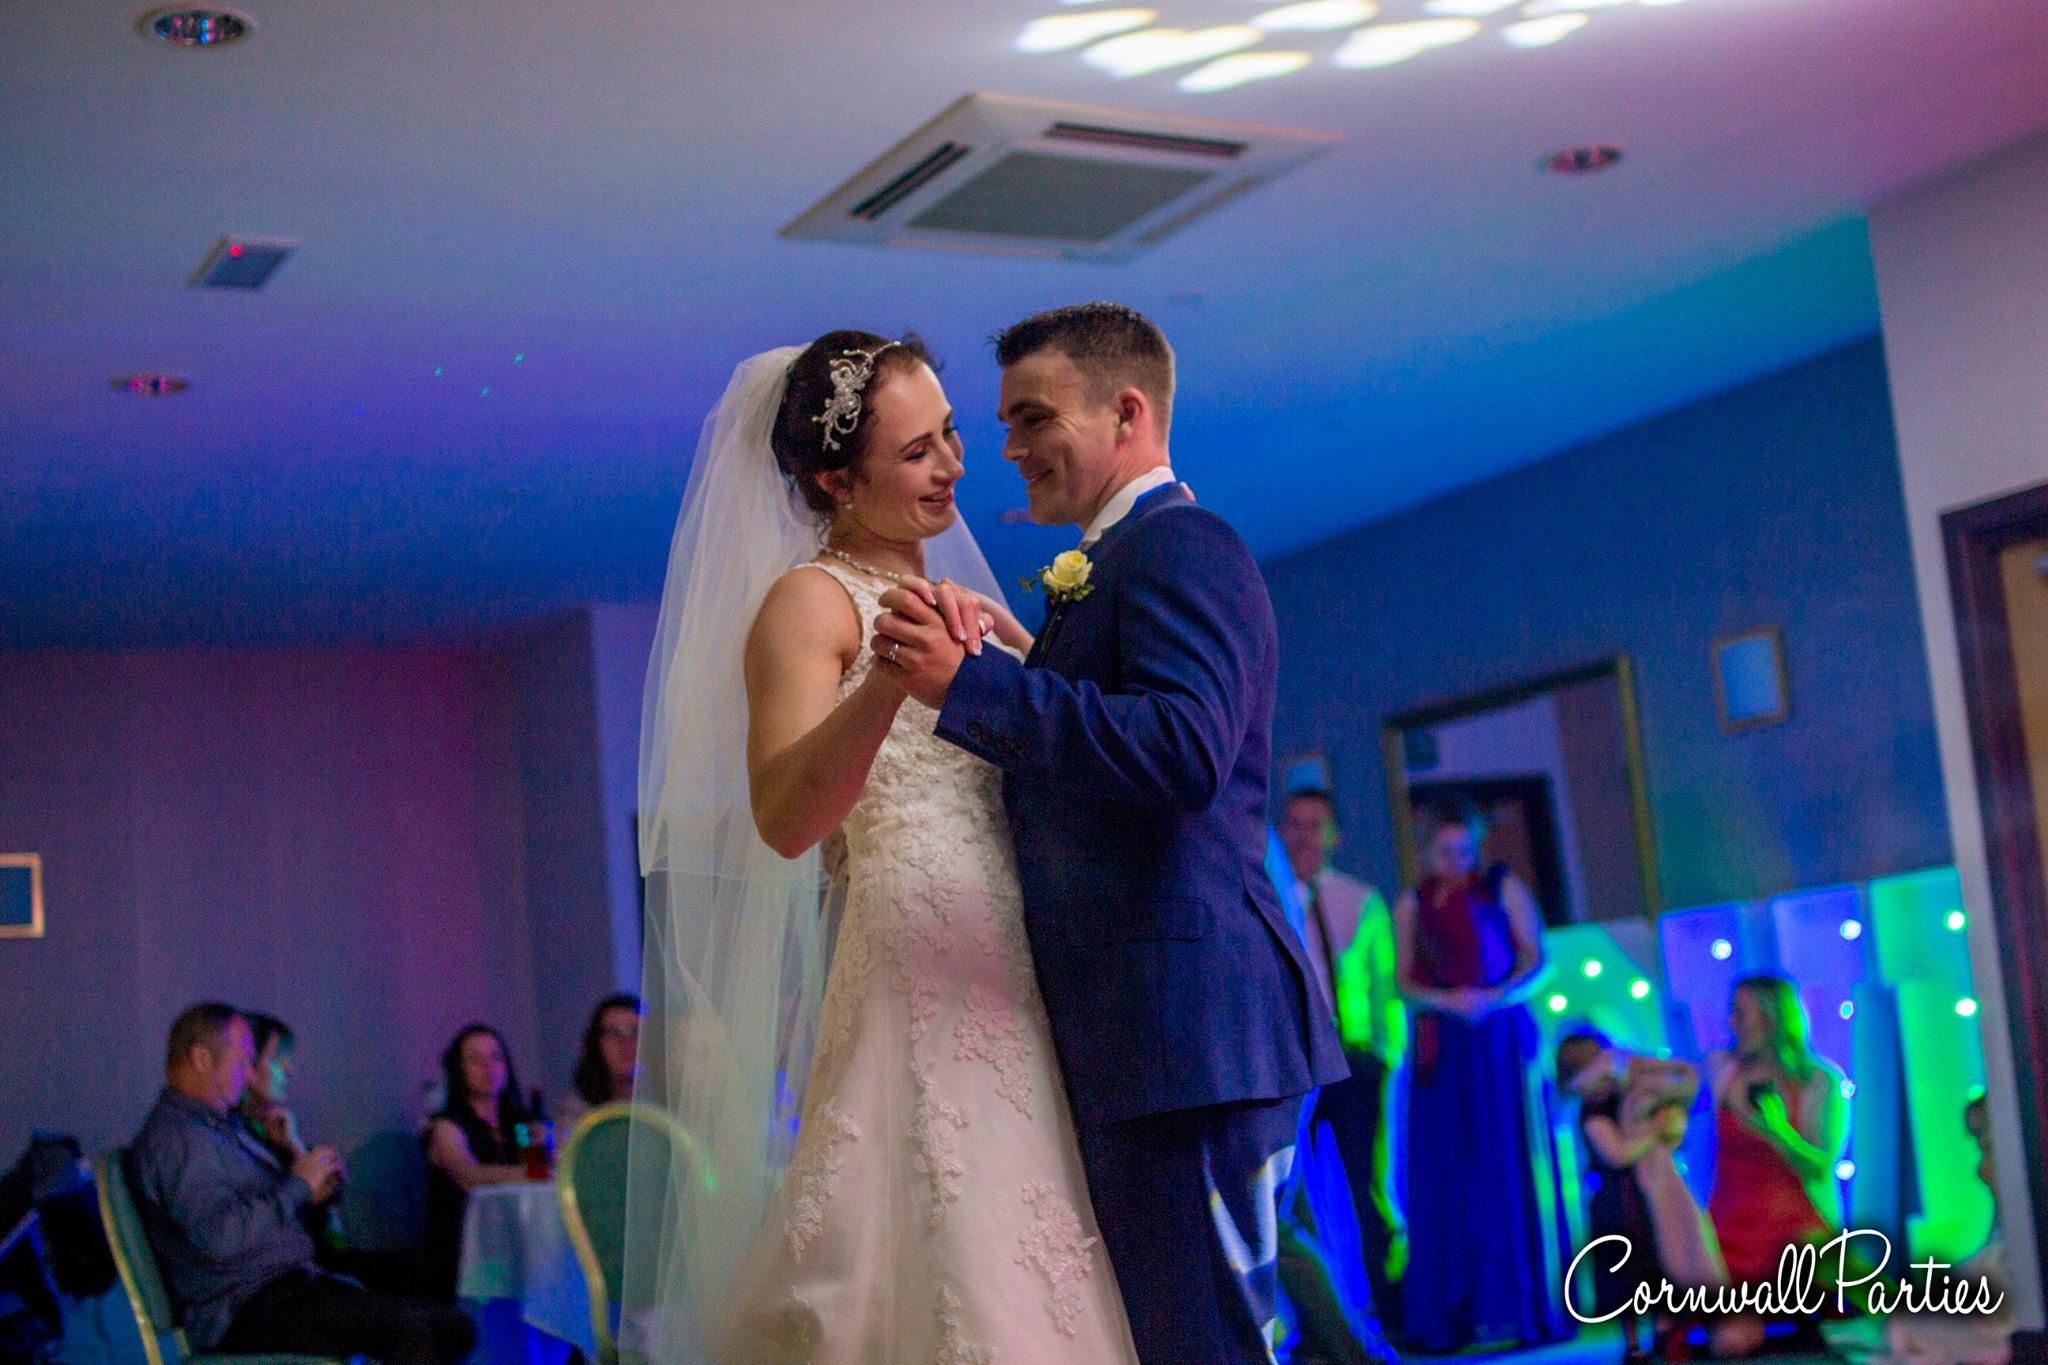 cornwall wedding disco dj photographer 19